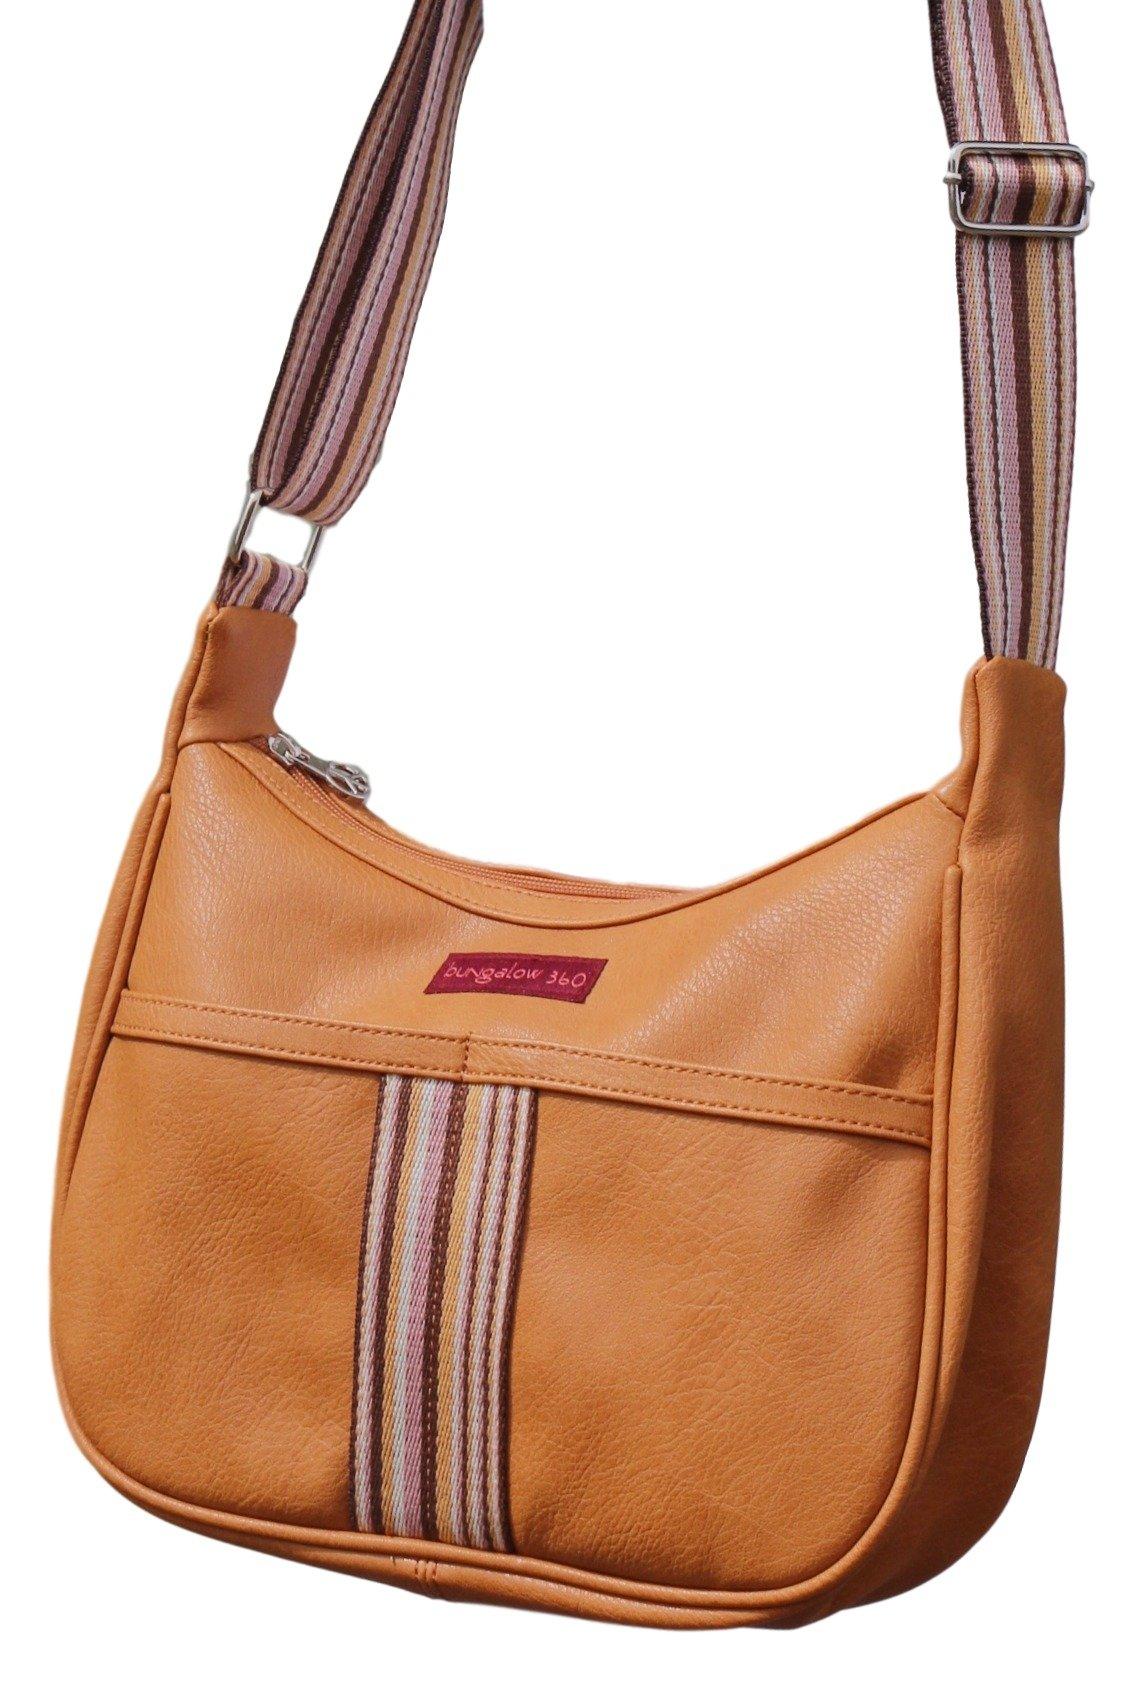 Bungalow 360 Original Vegan Leather Striped Hobo Bag (Curry)